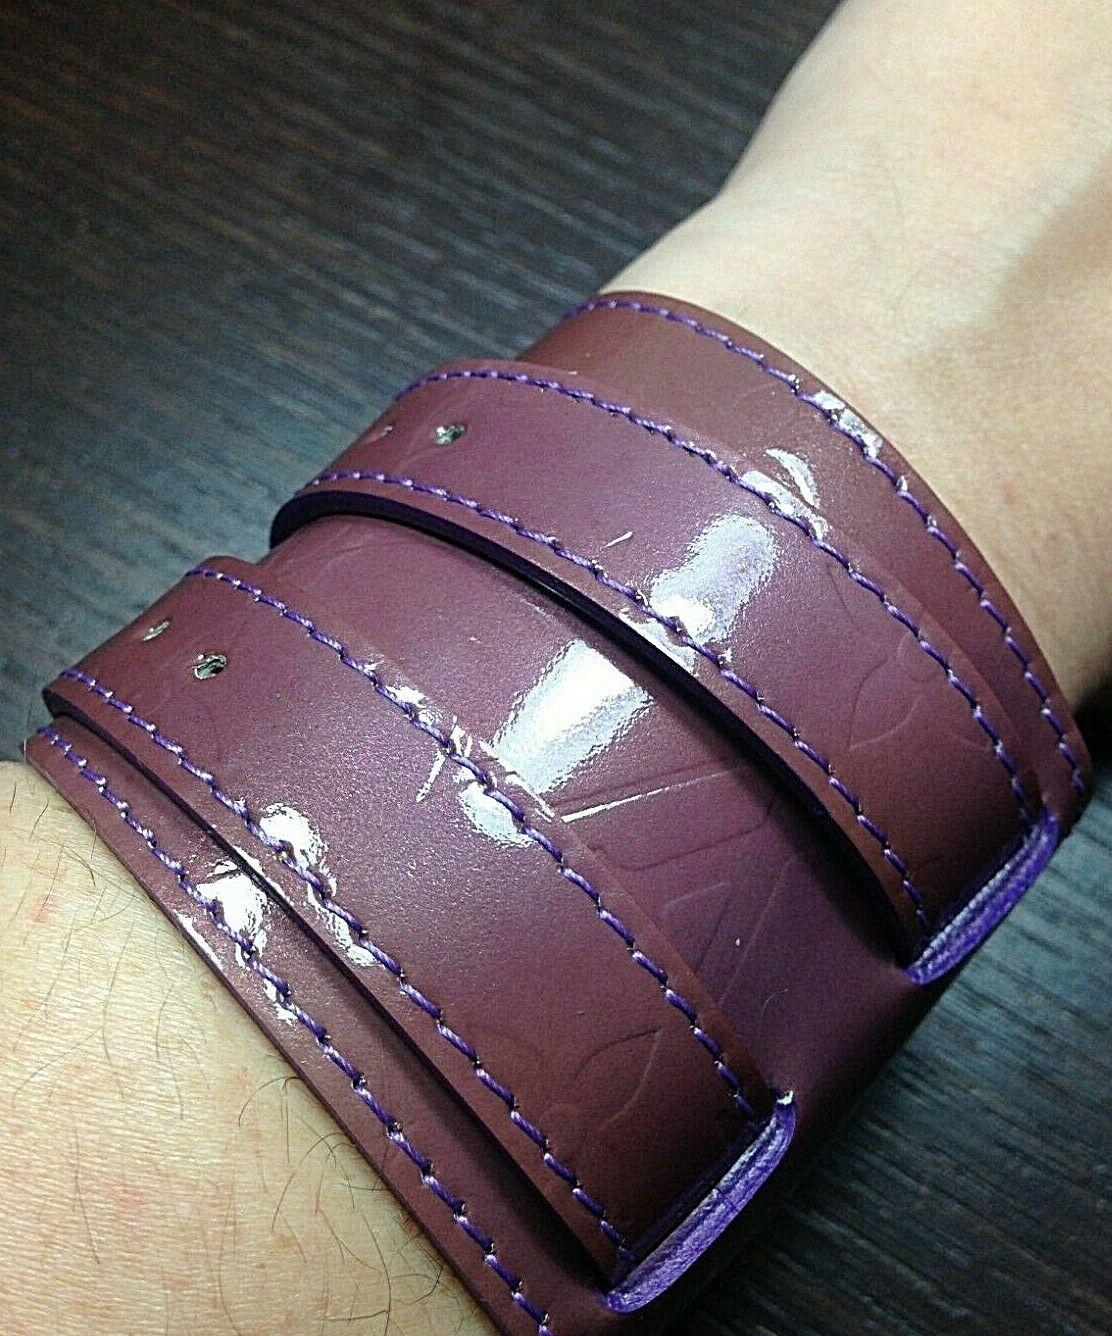 Louis Vuitton Charlton Vernis Wrap Cuff Statement Bracelet - $490.05